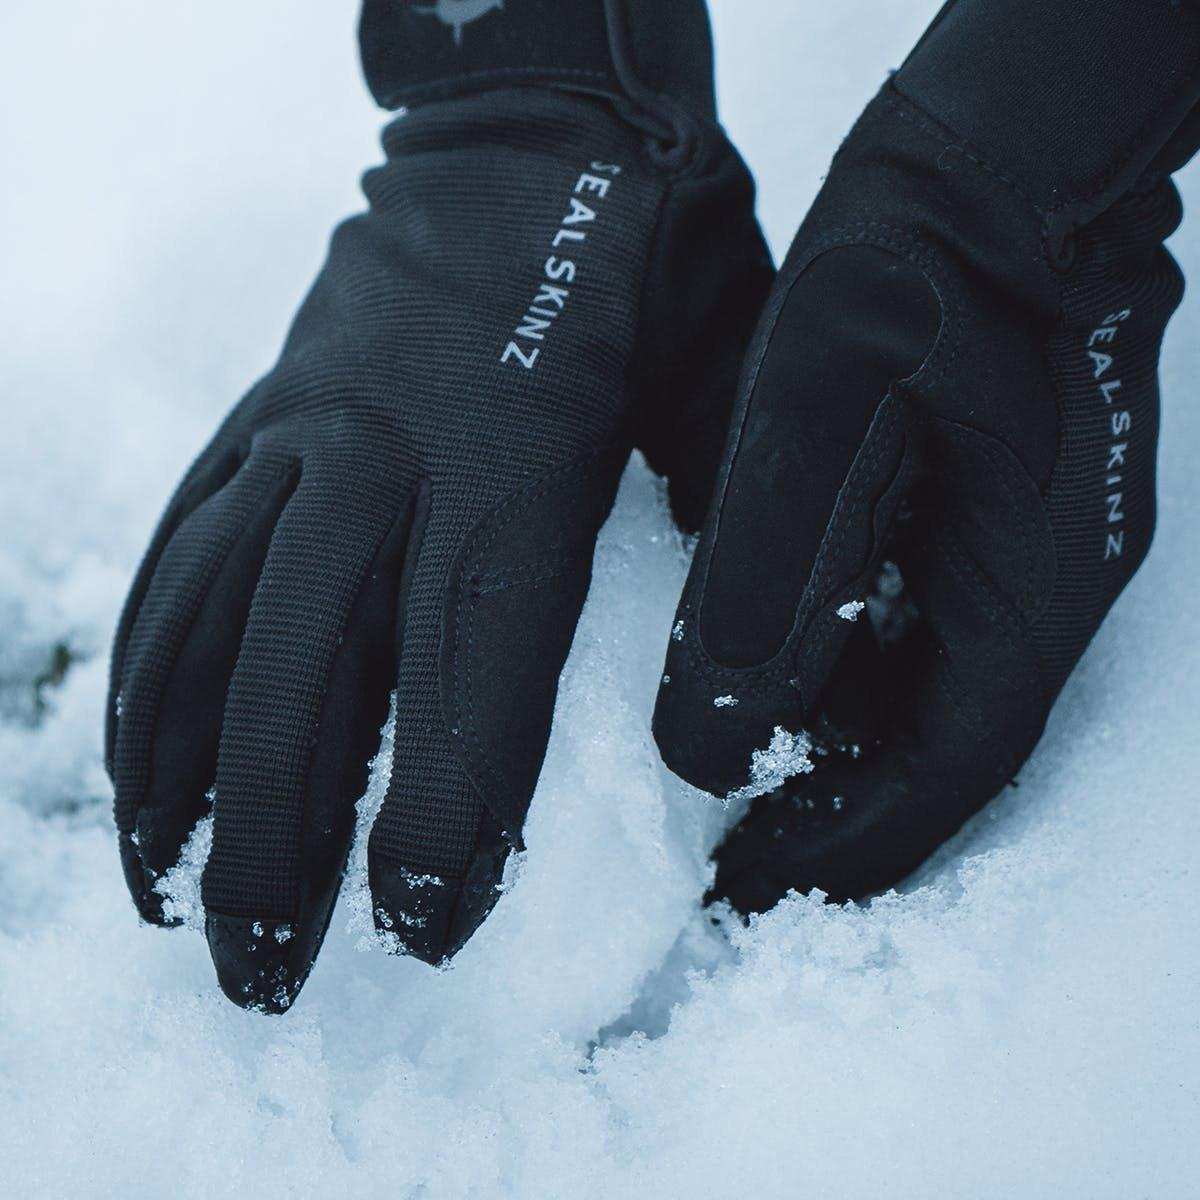 Sealskinz Unisex Waterproof All Weather Glove - Black